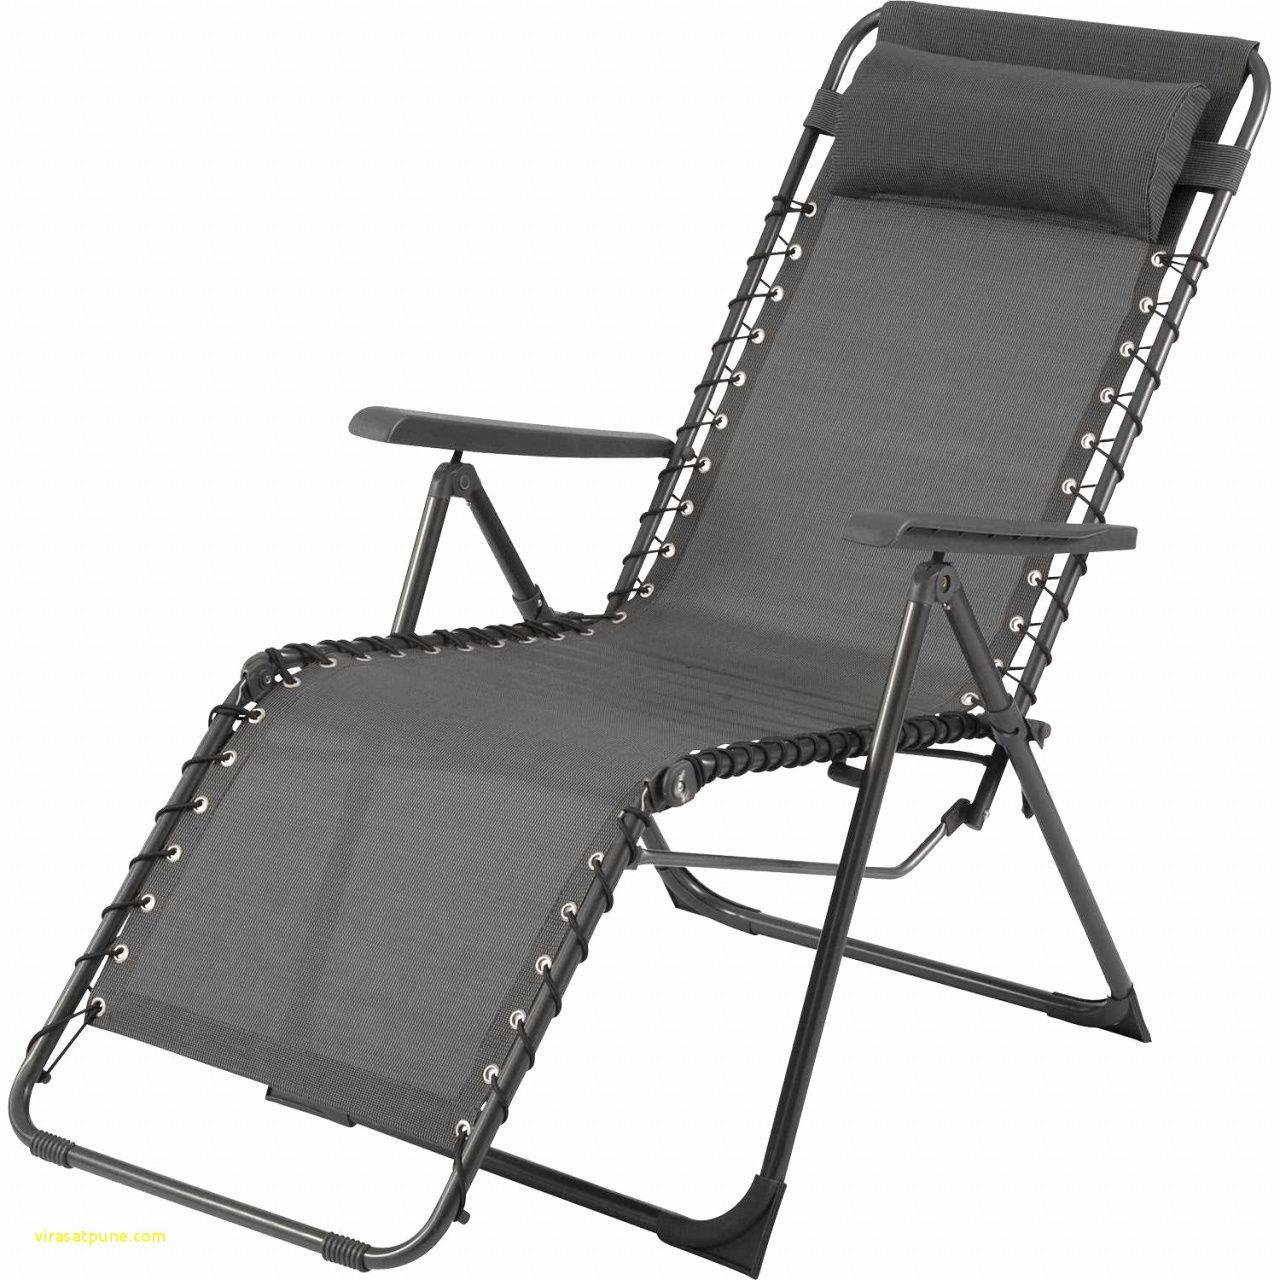 Meuble De Cuisine Decathlon 50 chaise de plage decathlon | relaxing chair, garden lounge